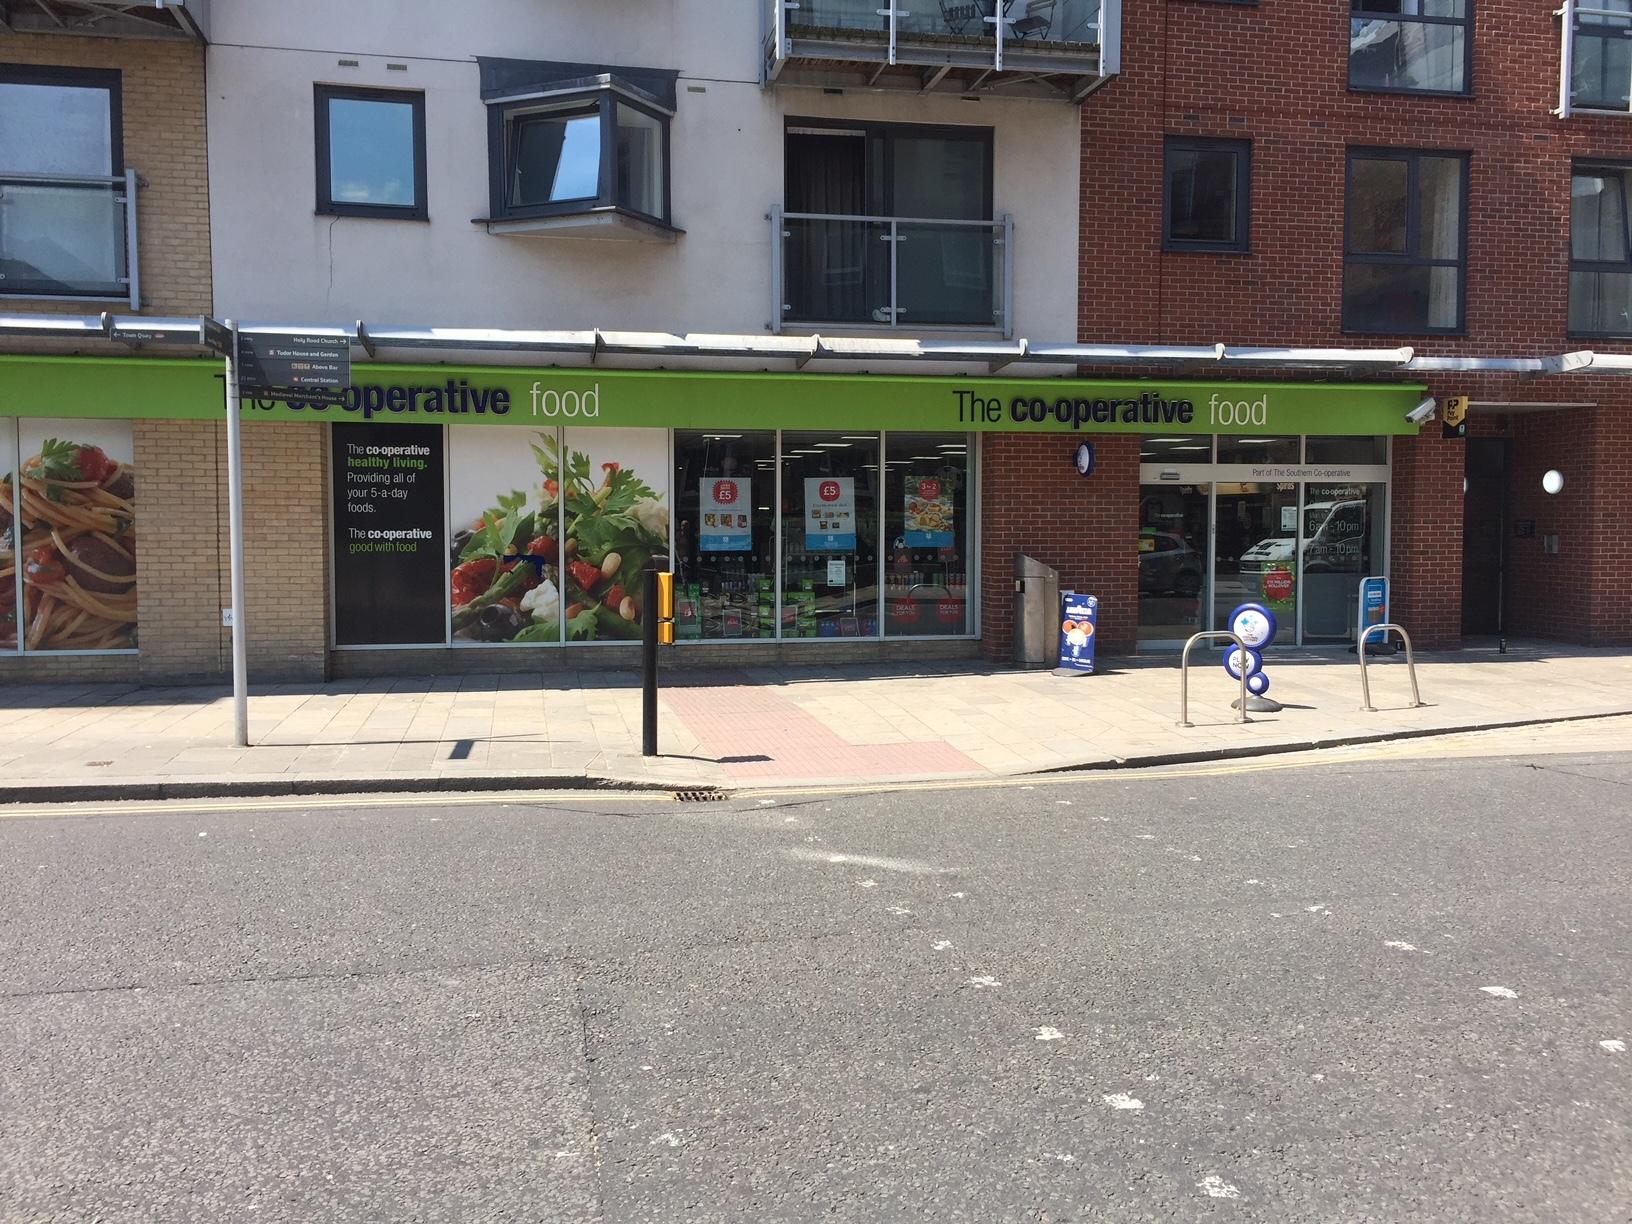 The Co-operative Food (117 High Street)